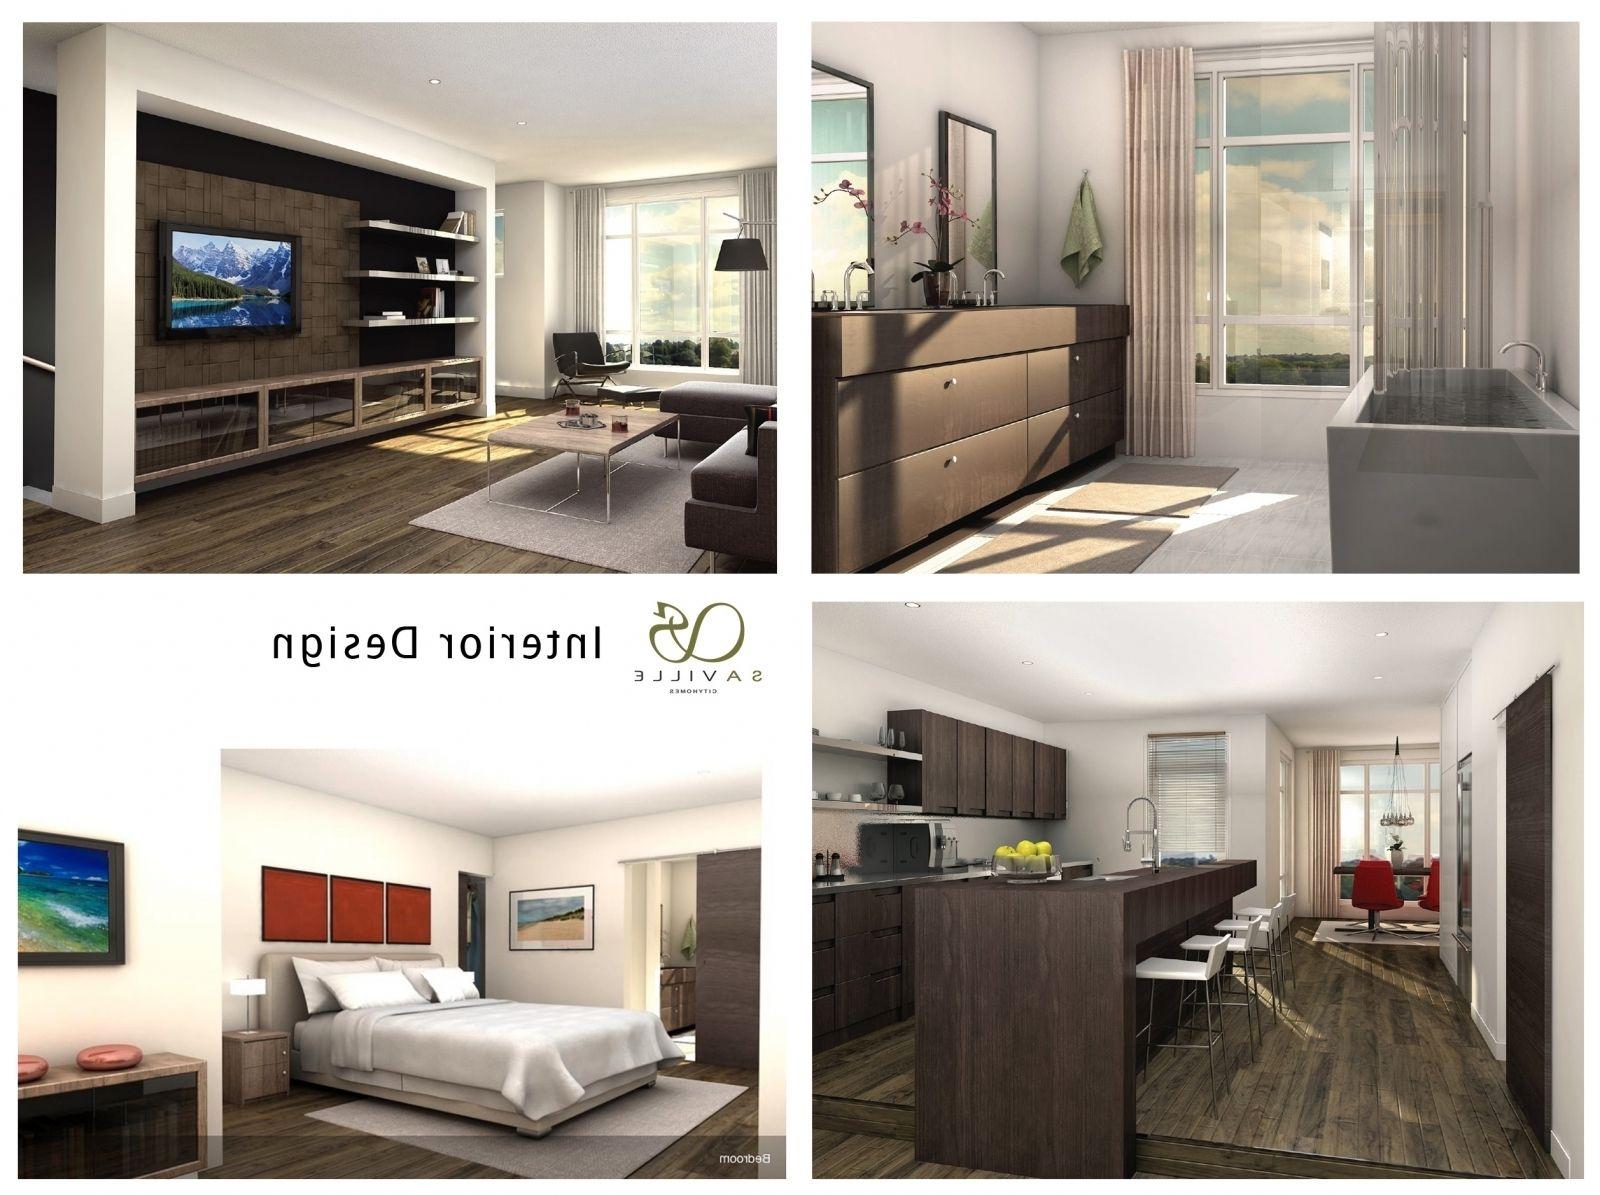 Apps To Design My Bedroom Design Your Own Bedroom Design Your